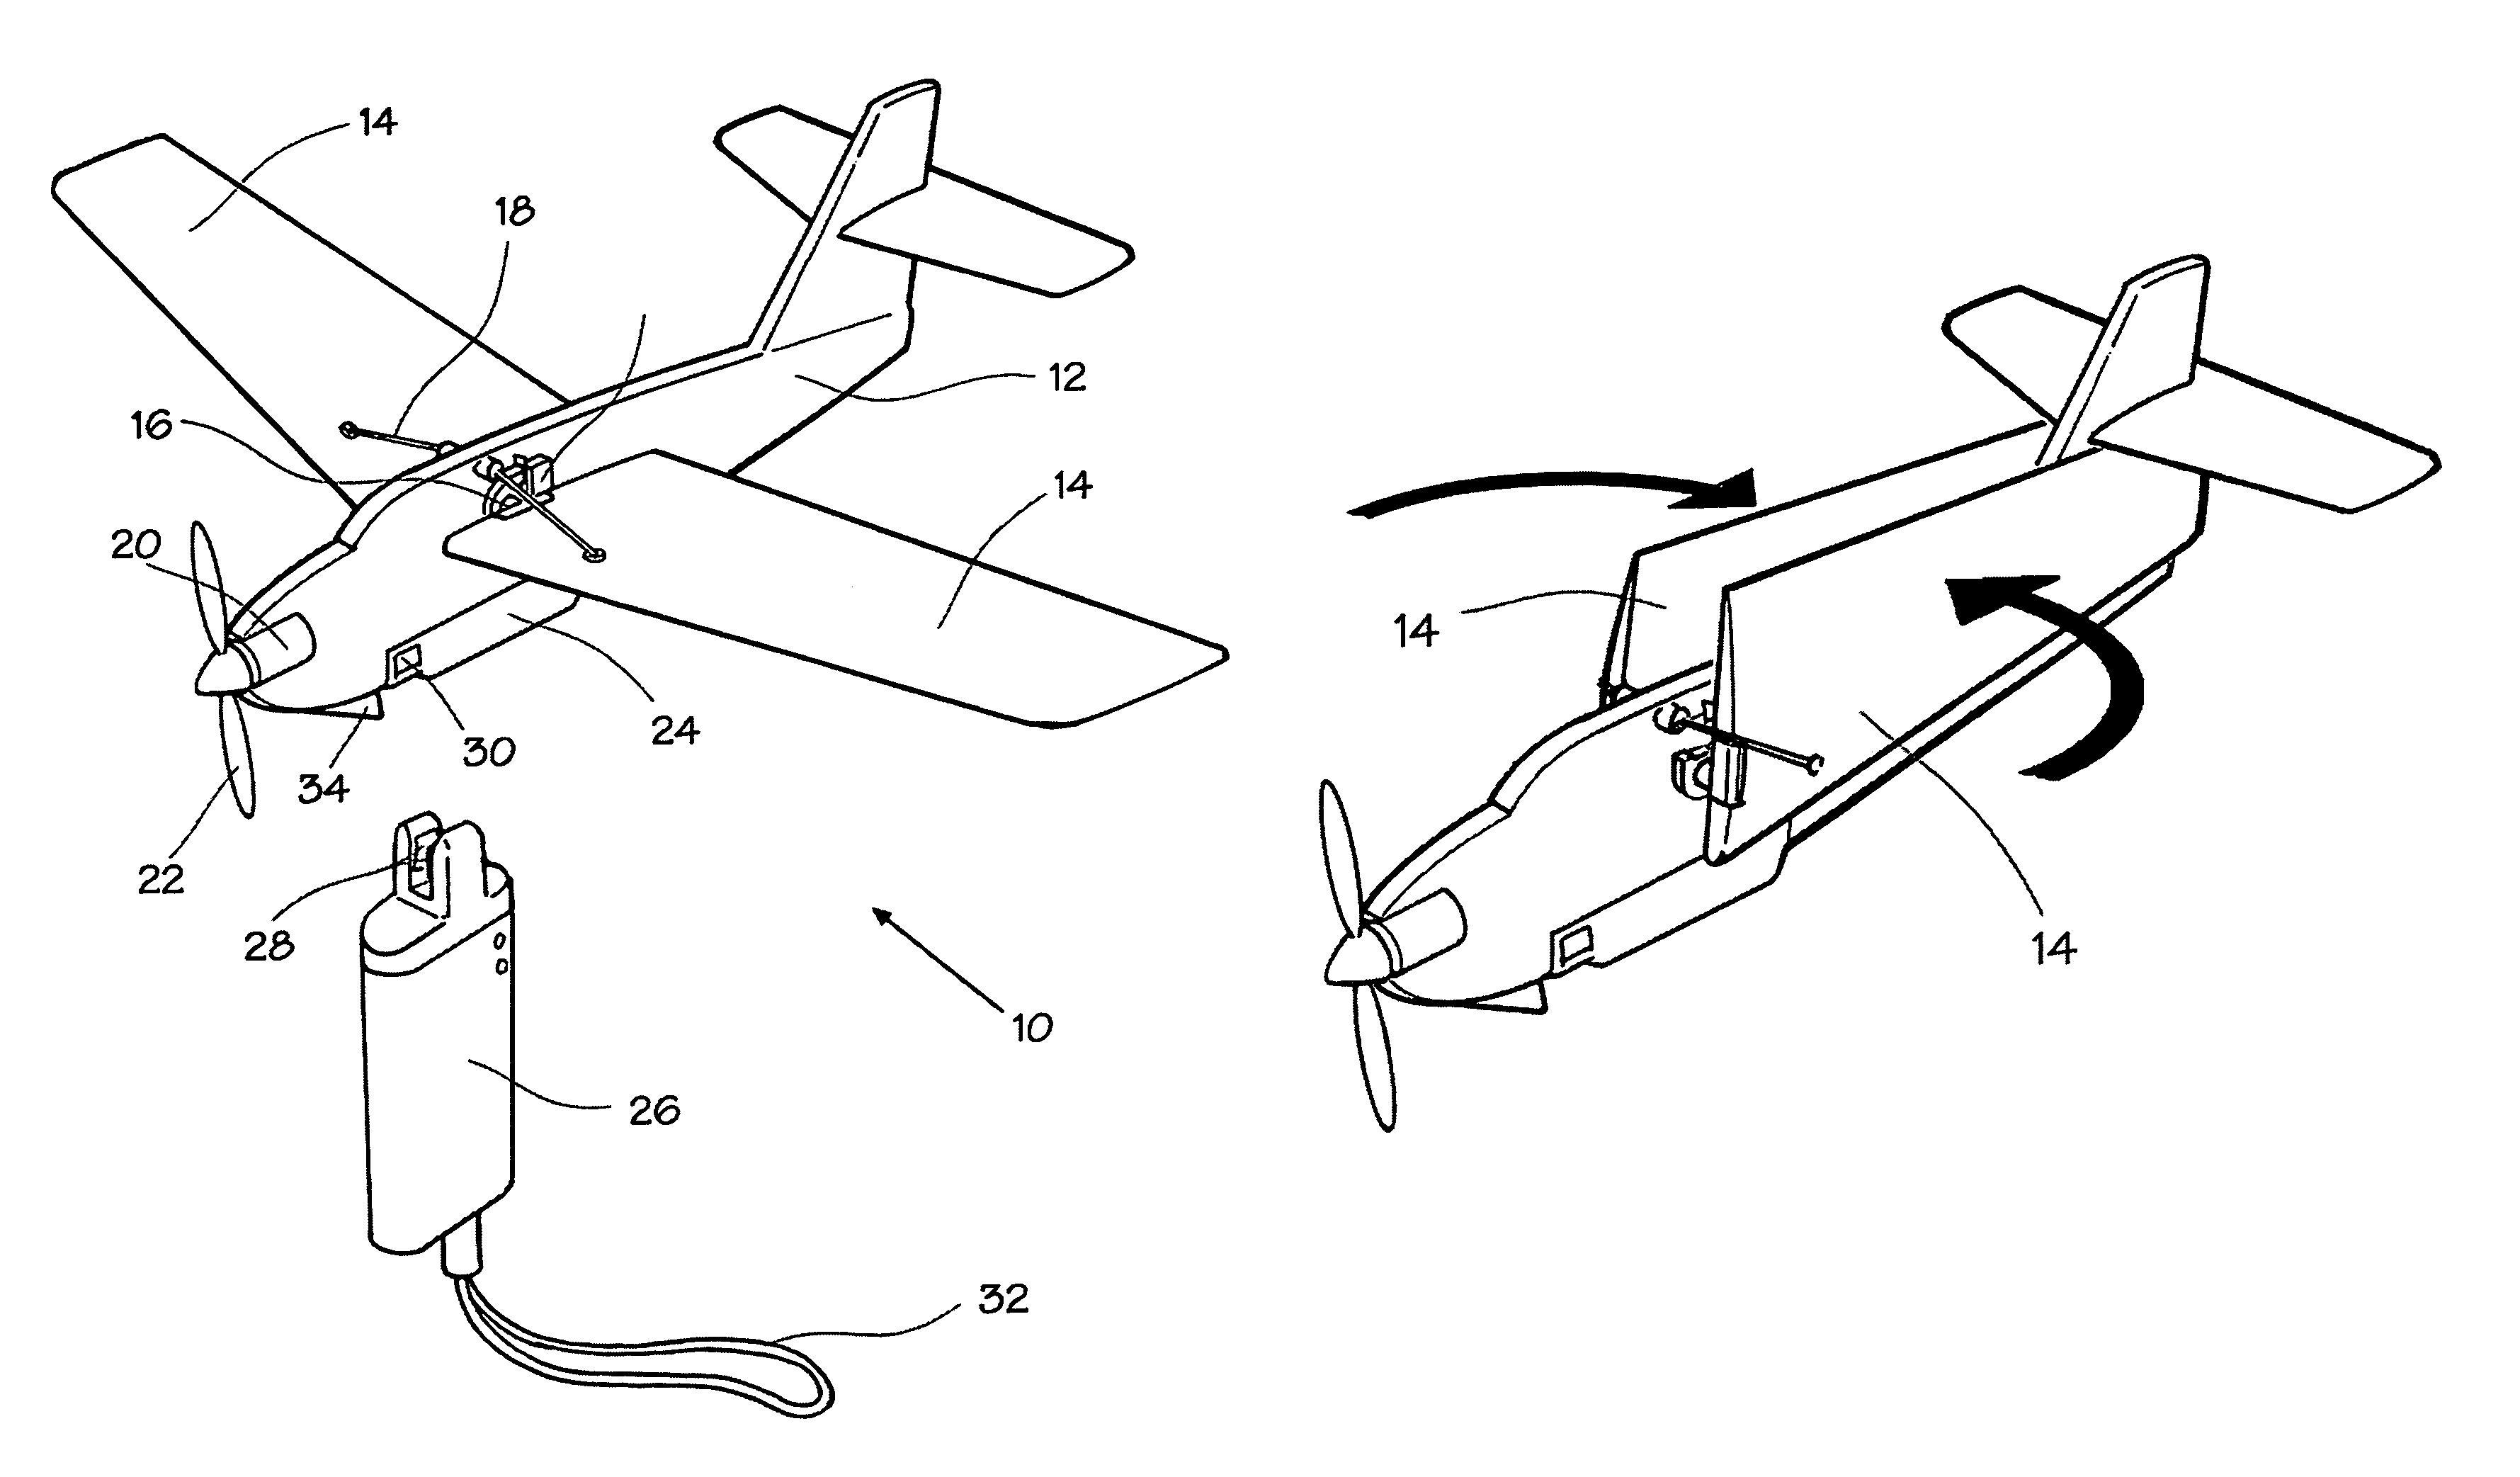 Drawn airplane toy line #10